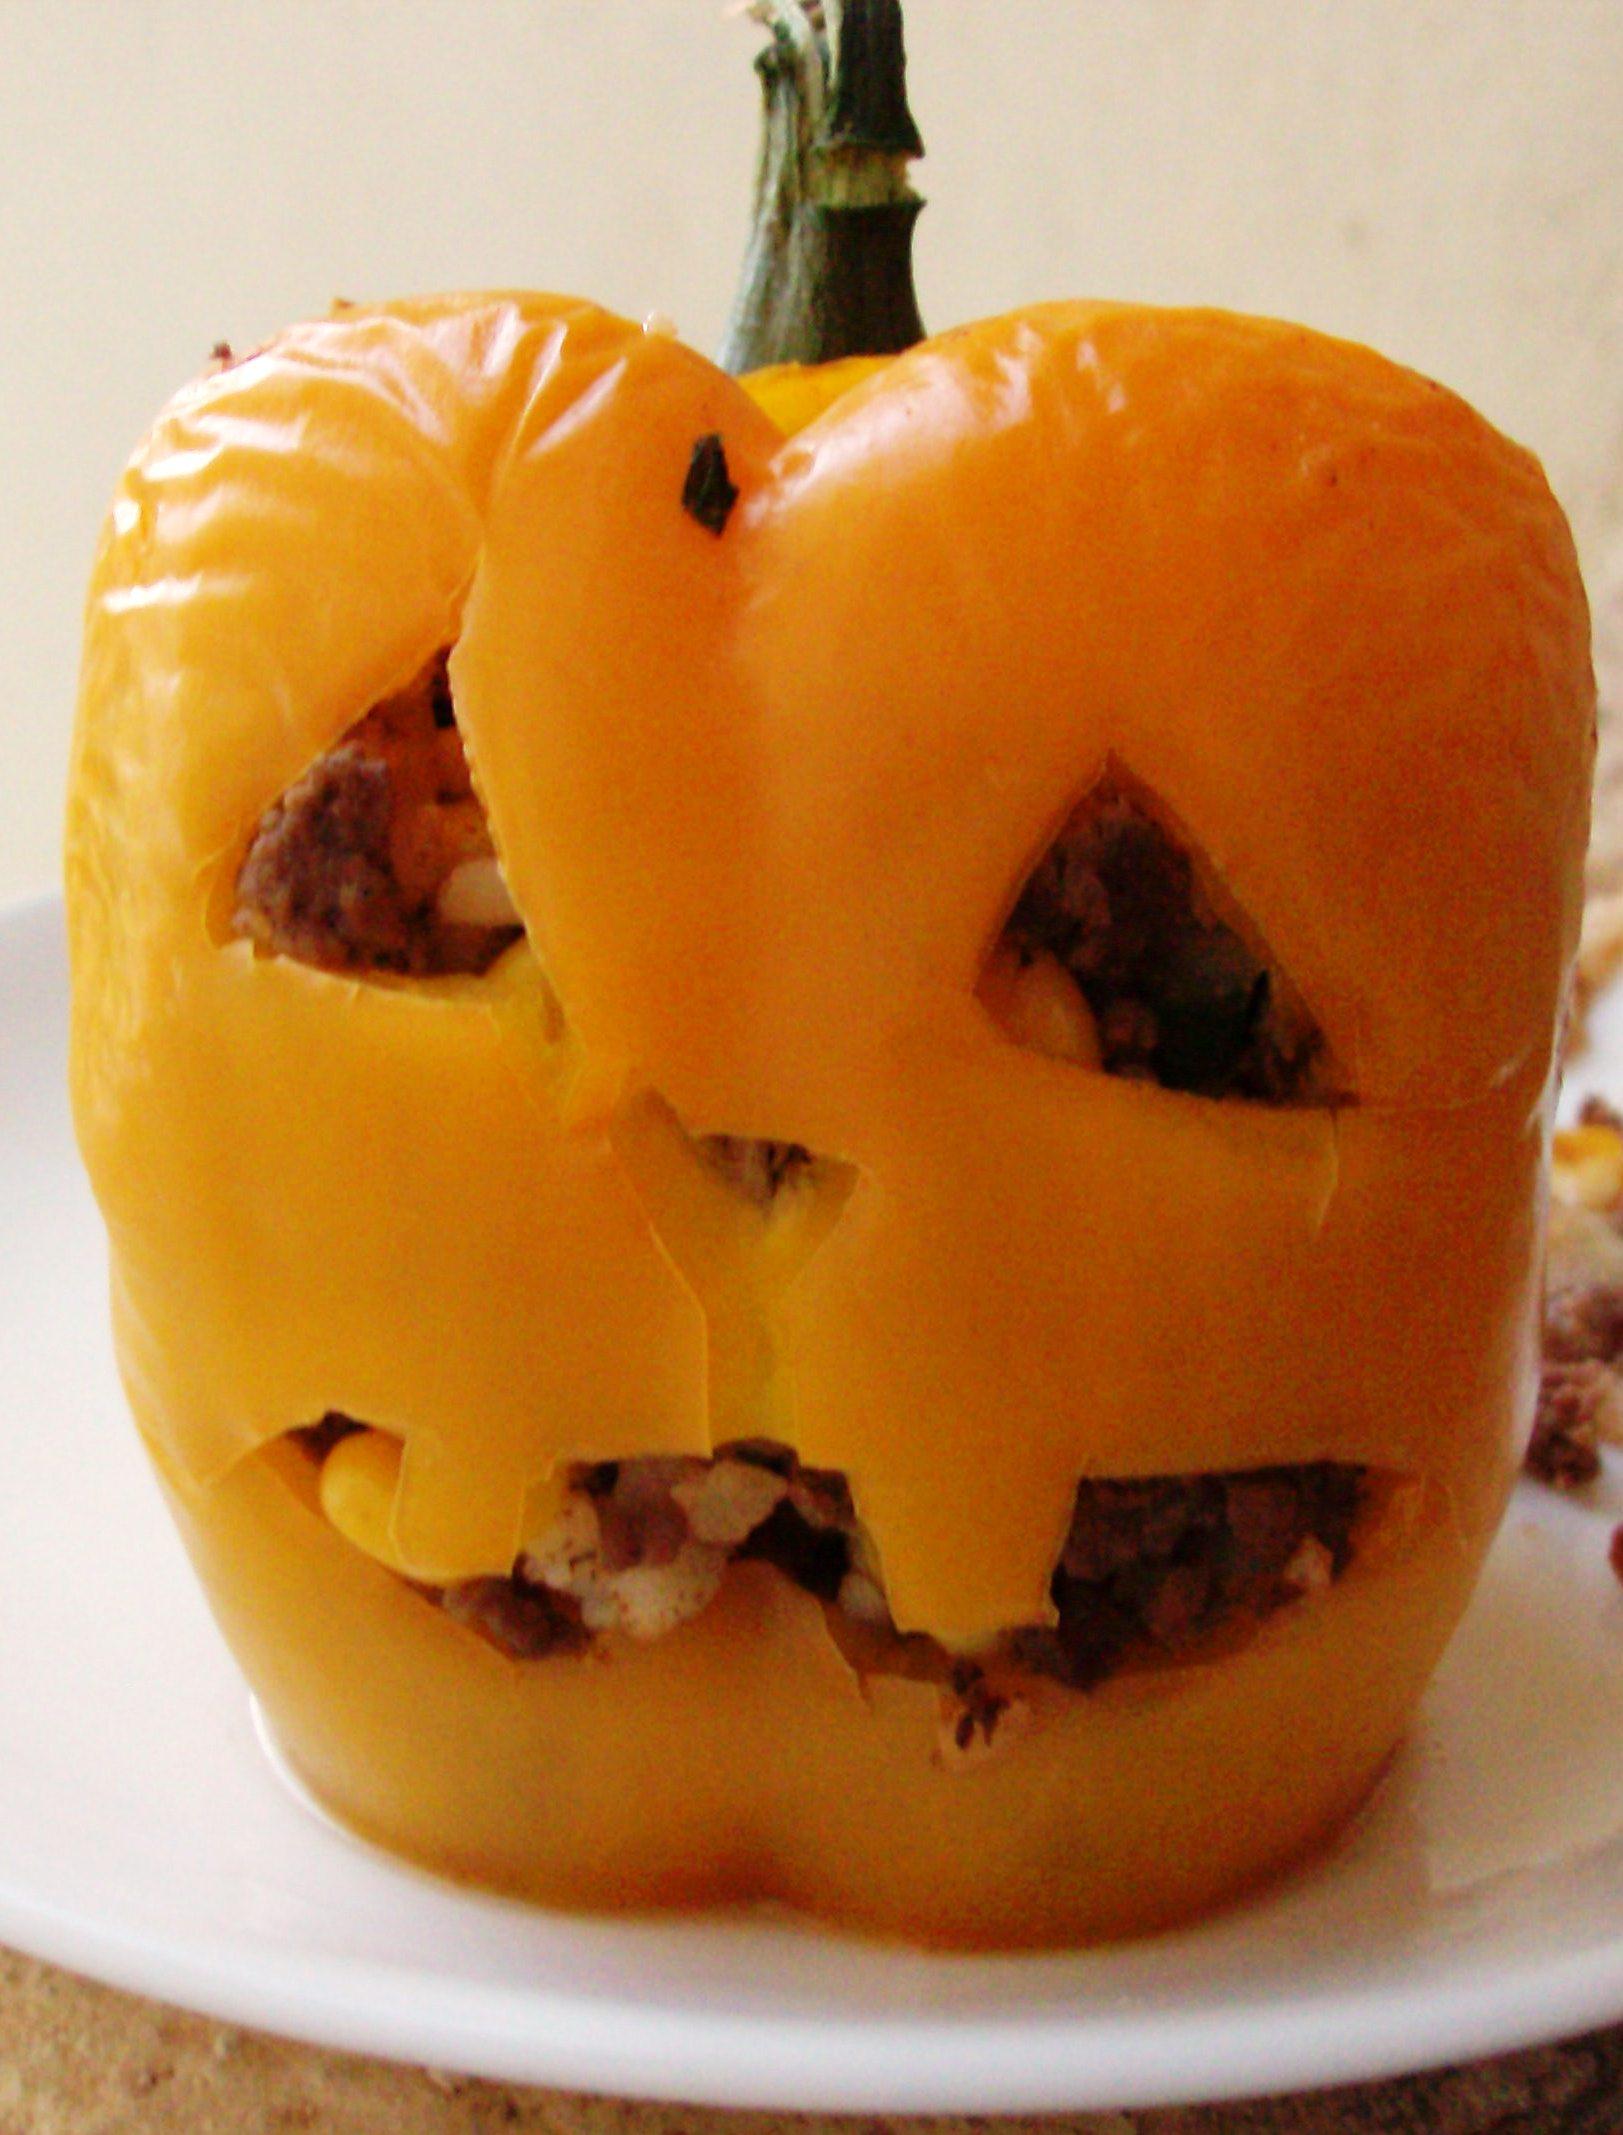 Halloween Food Ideas Stuffed Pepper Jack O Lanterns And Monster Meatballs Mommysavers